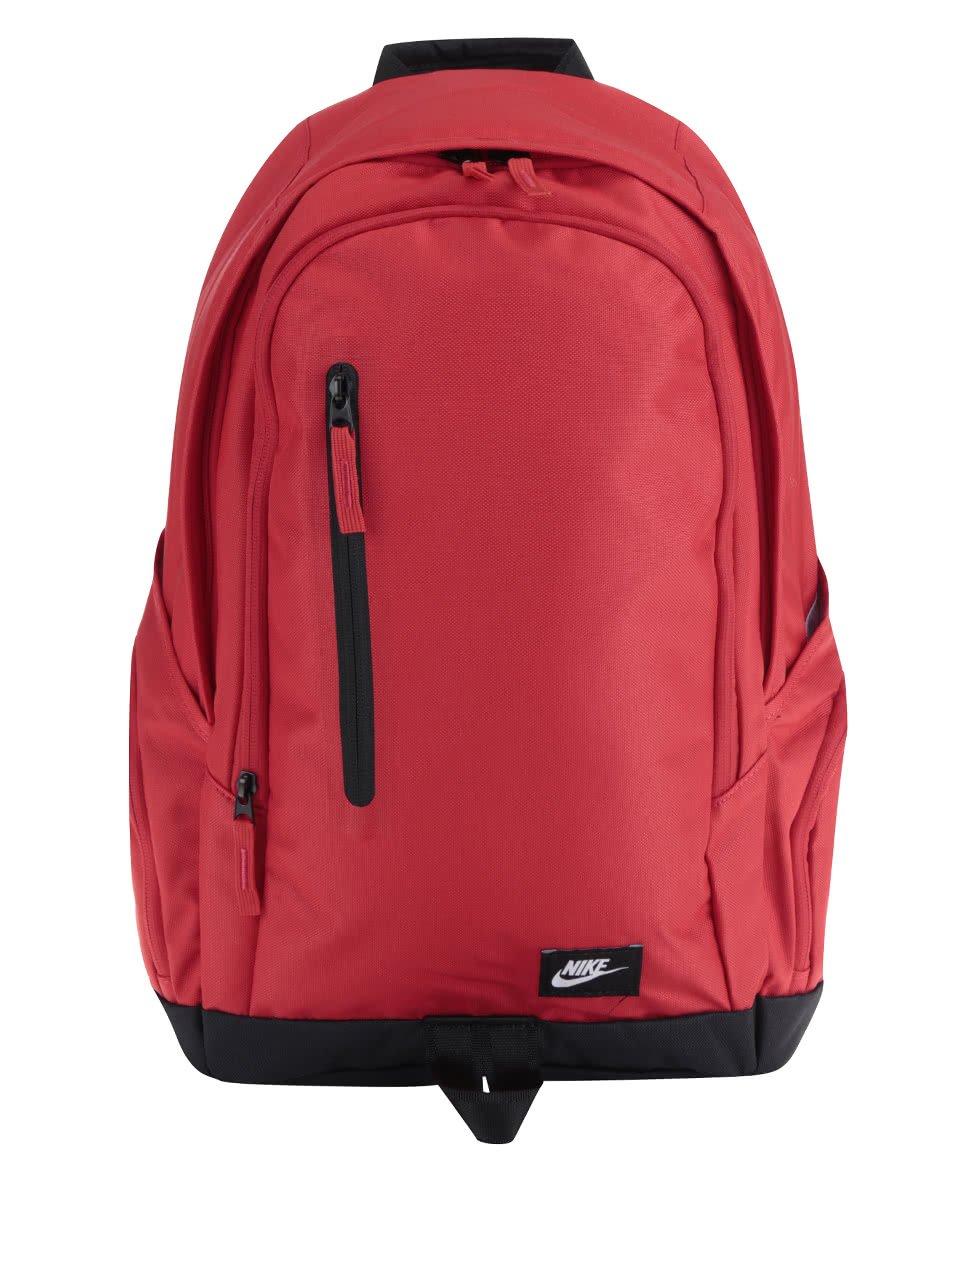 Červený unisex batoh Nike 26 l